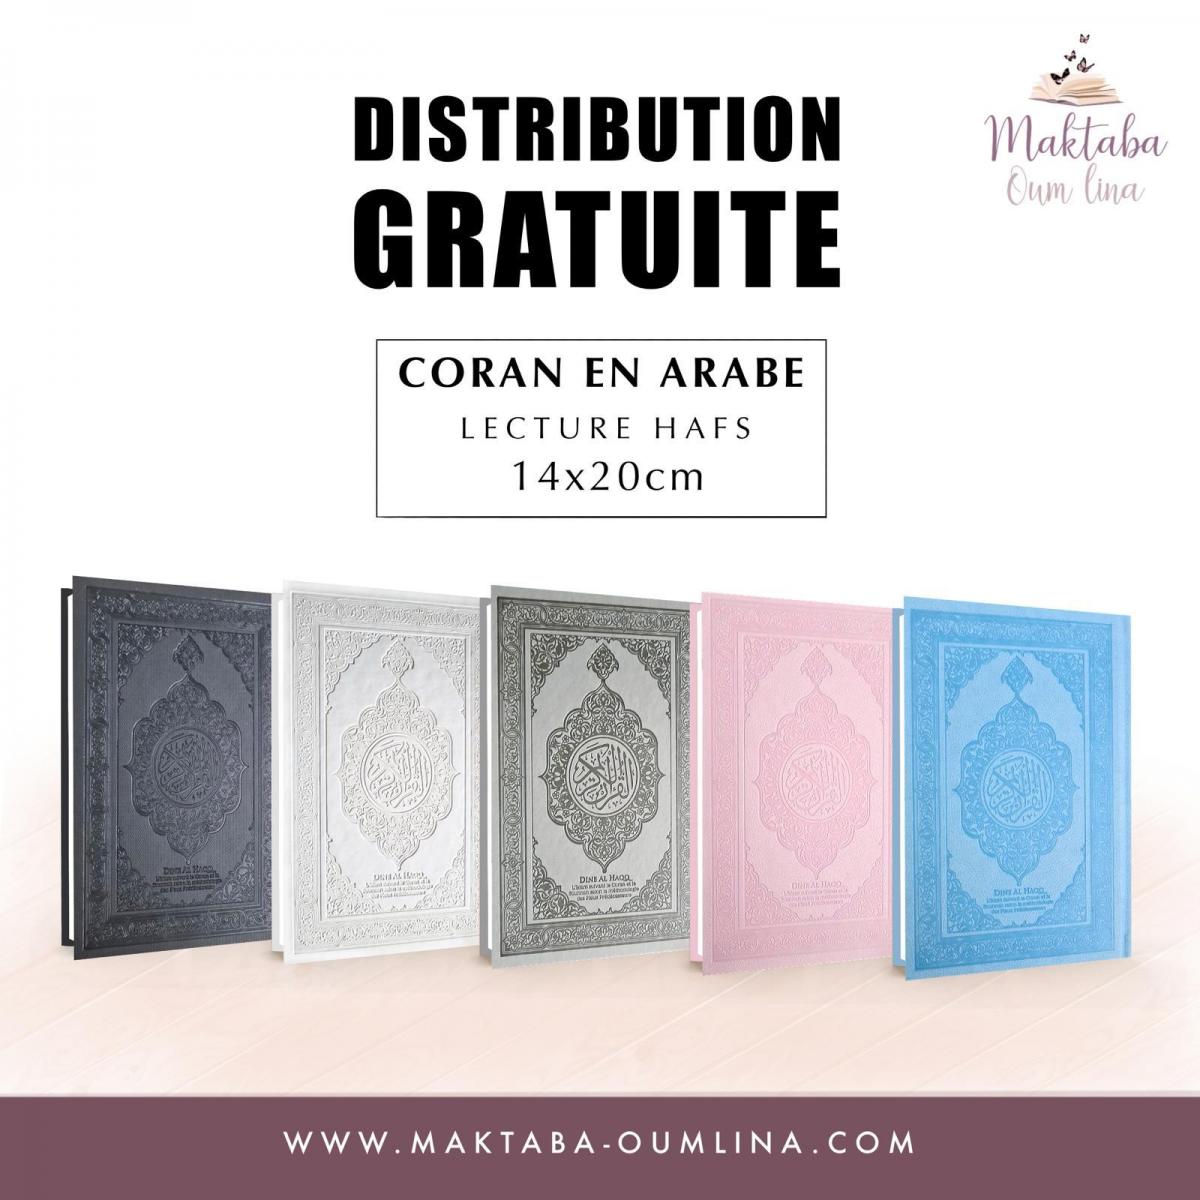 CORAN arabe (lecture hafs) - GRATUIT